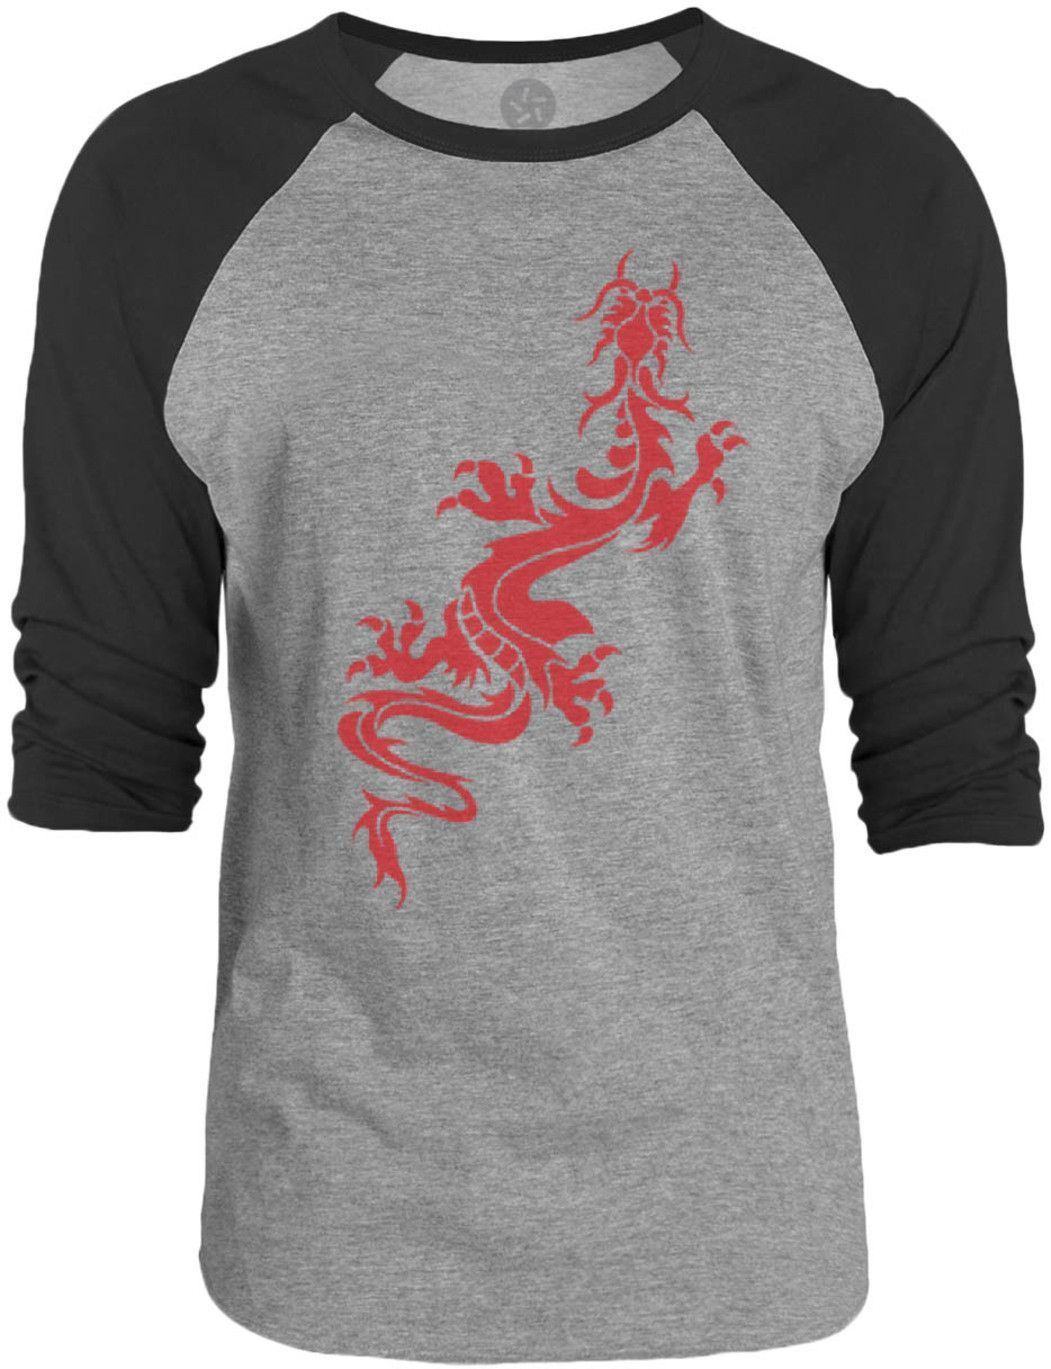 Big Texas Dragon Stencil (Red) 3/4-Sleeve Raglan Baseball T-Shirt